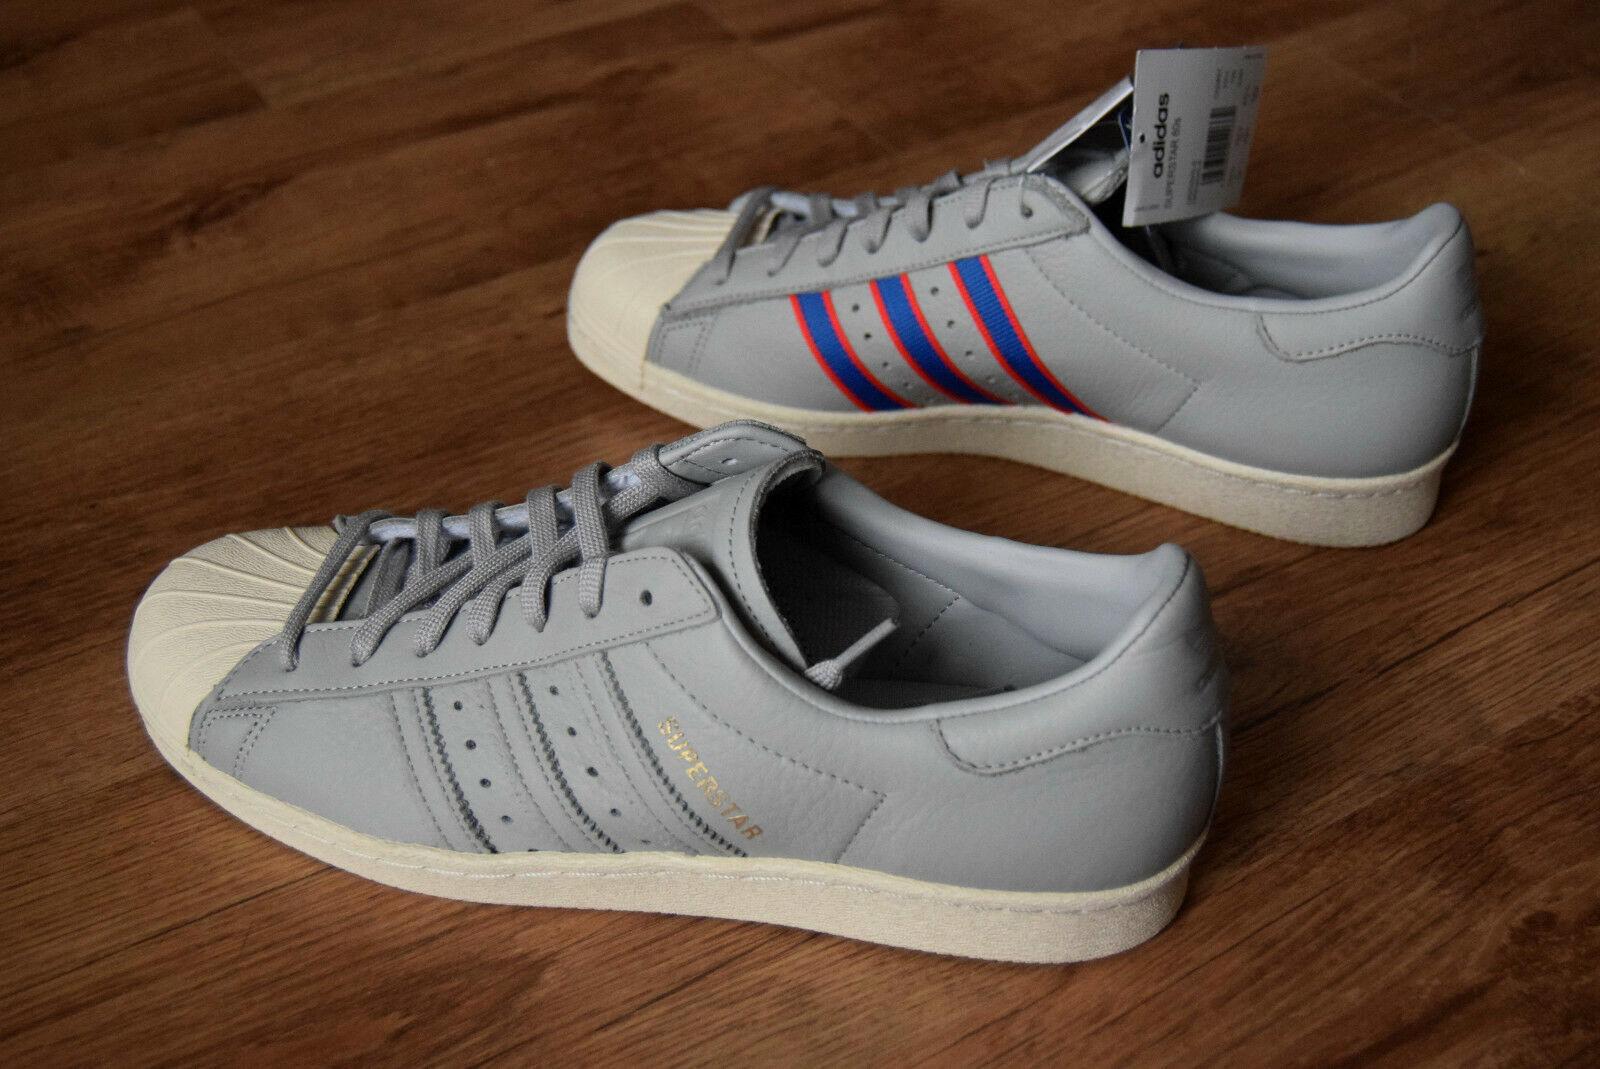 Adidas Superstar 80s 42 42,5 43 44 45 46 CQ2657 cAmPuS sTan smitH forUm top ten